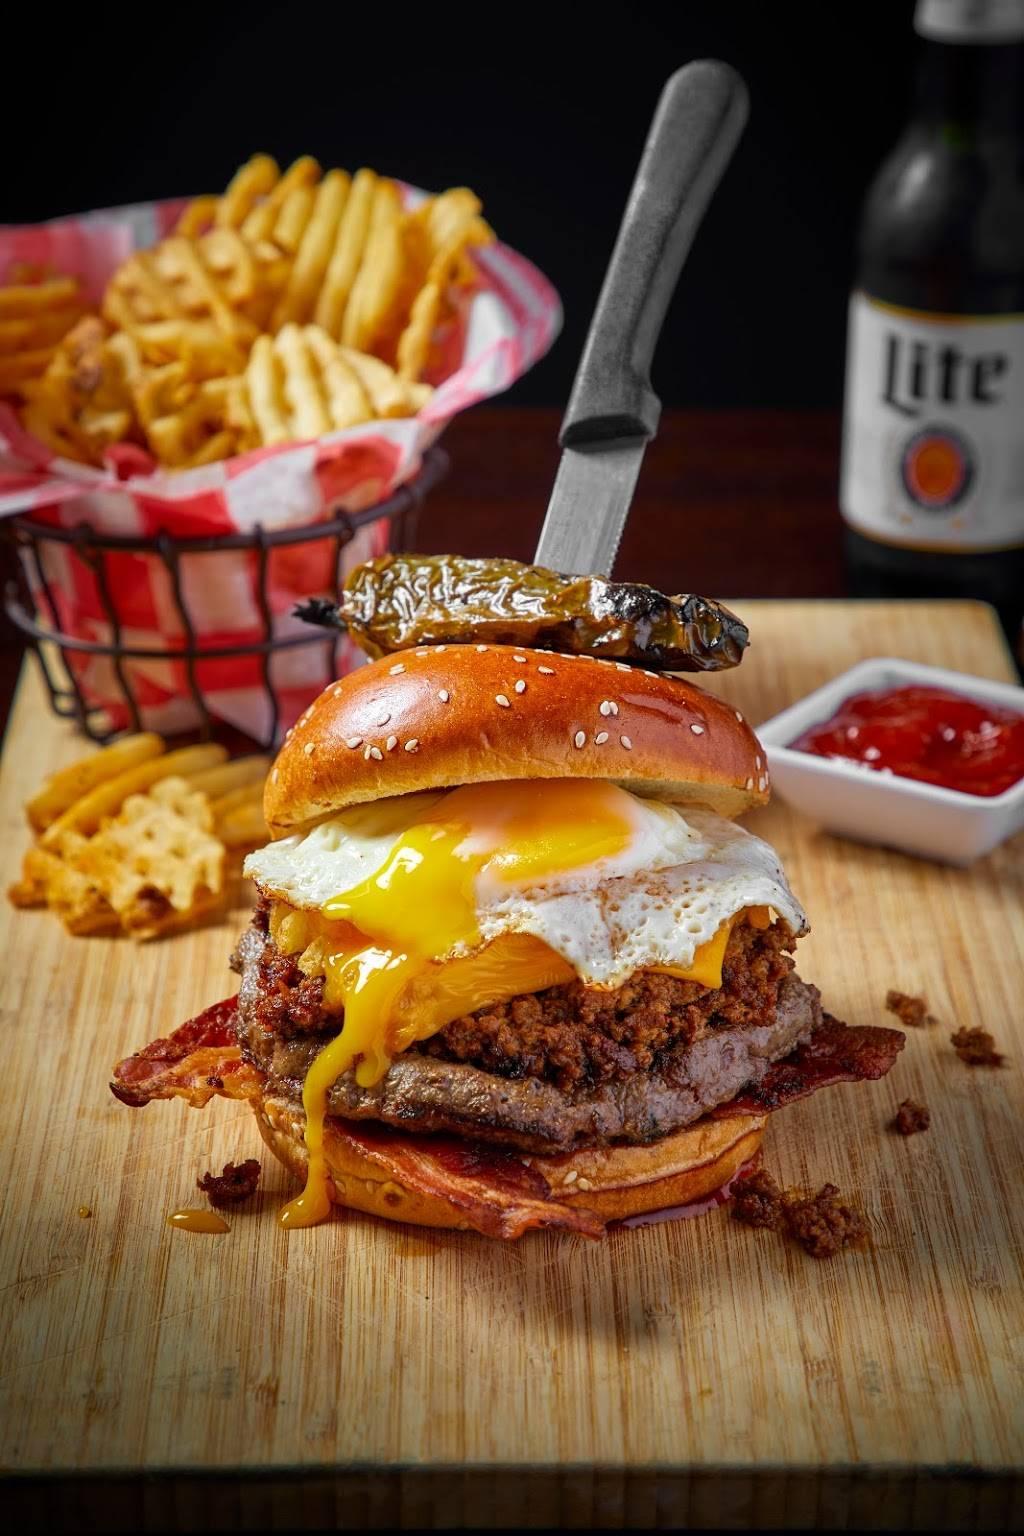 Crosstown Pub & Grill Naperville | restaurant | 909 E Ogden Ave, Naperville, IL 60563, USA | 6303579775 OR +1 630-357-9775